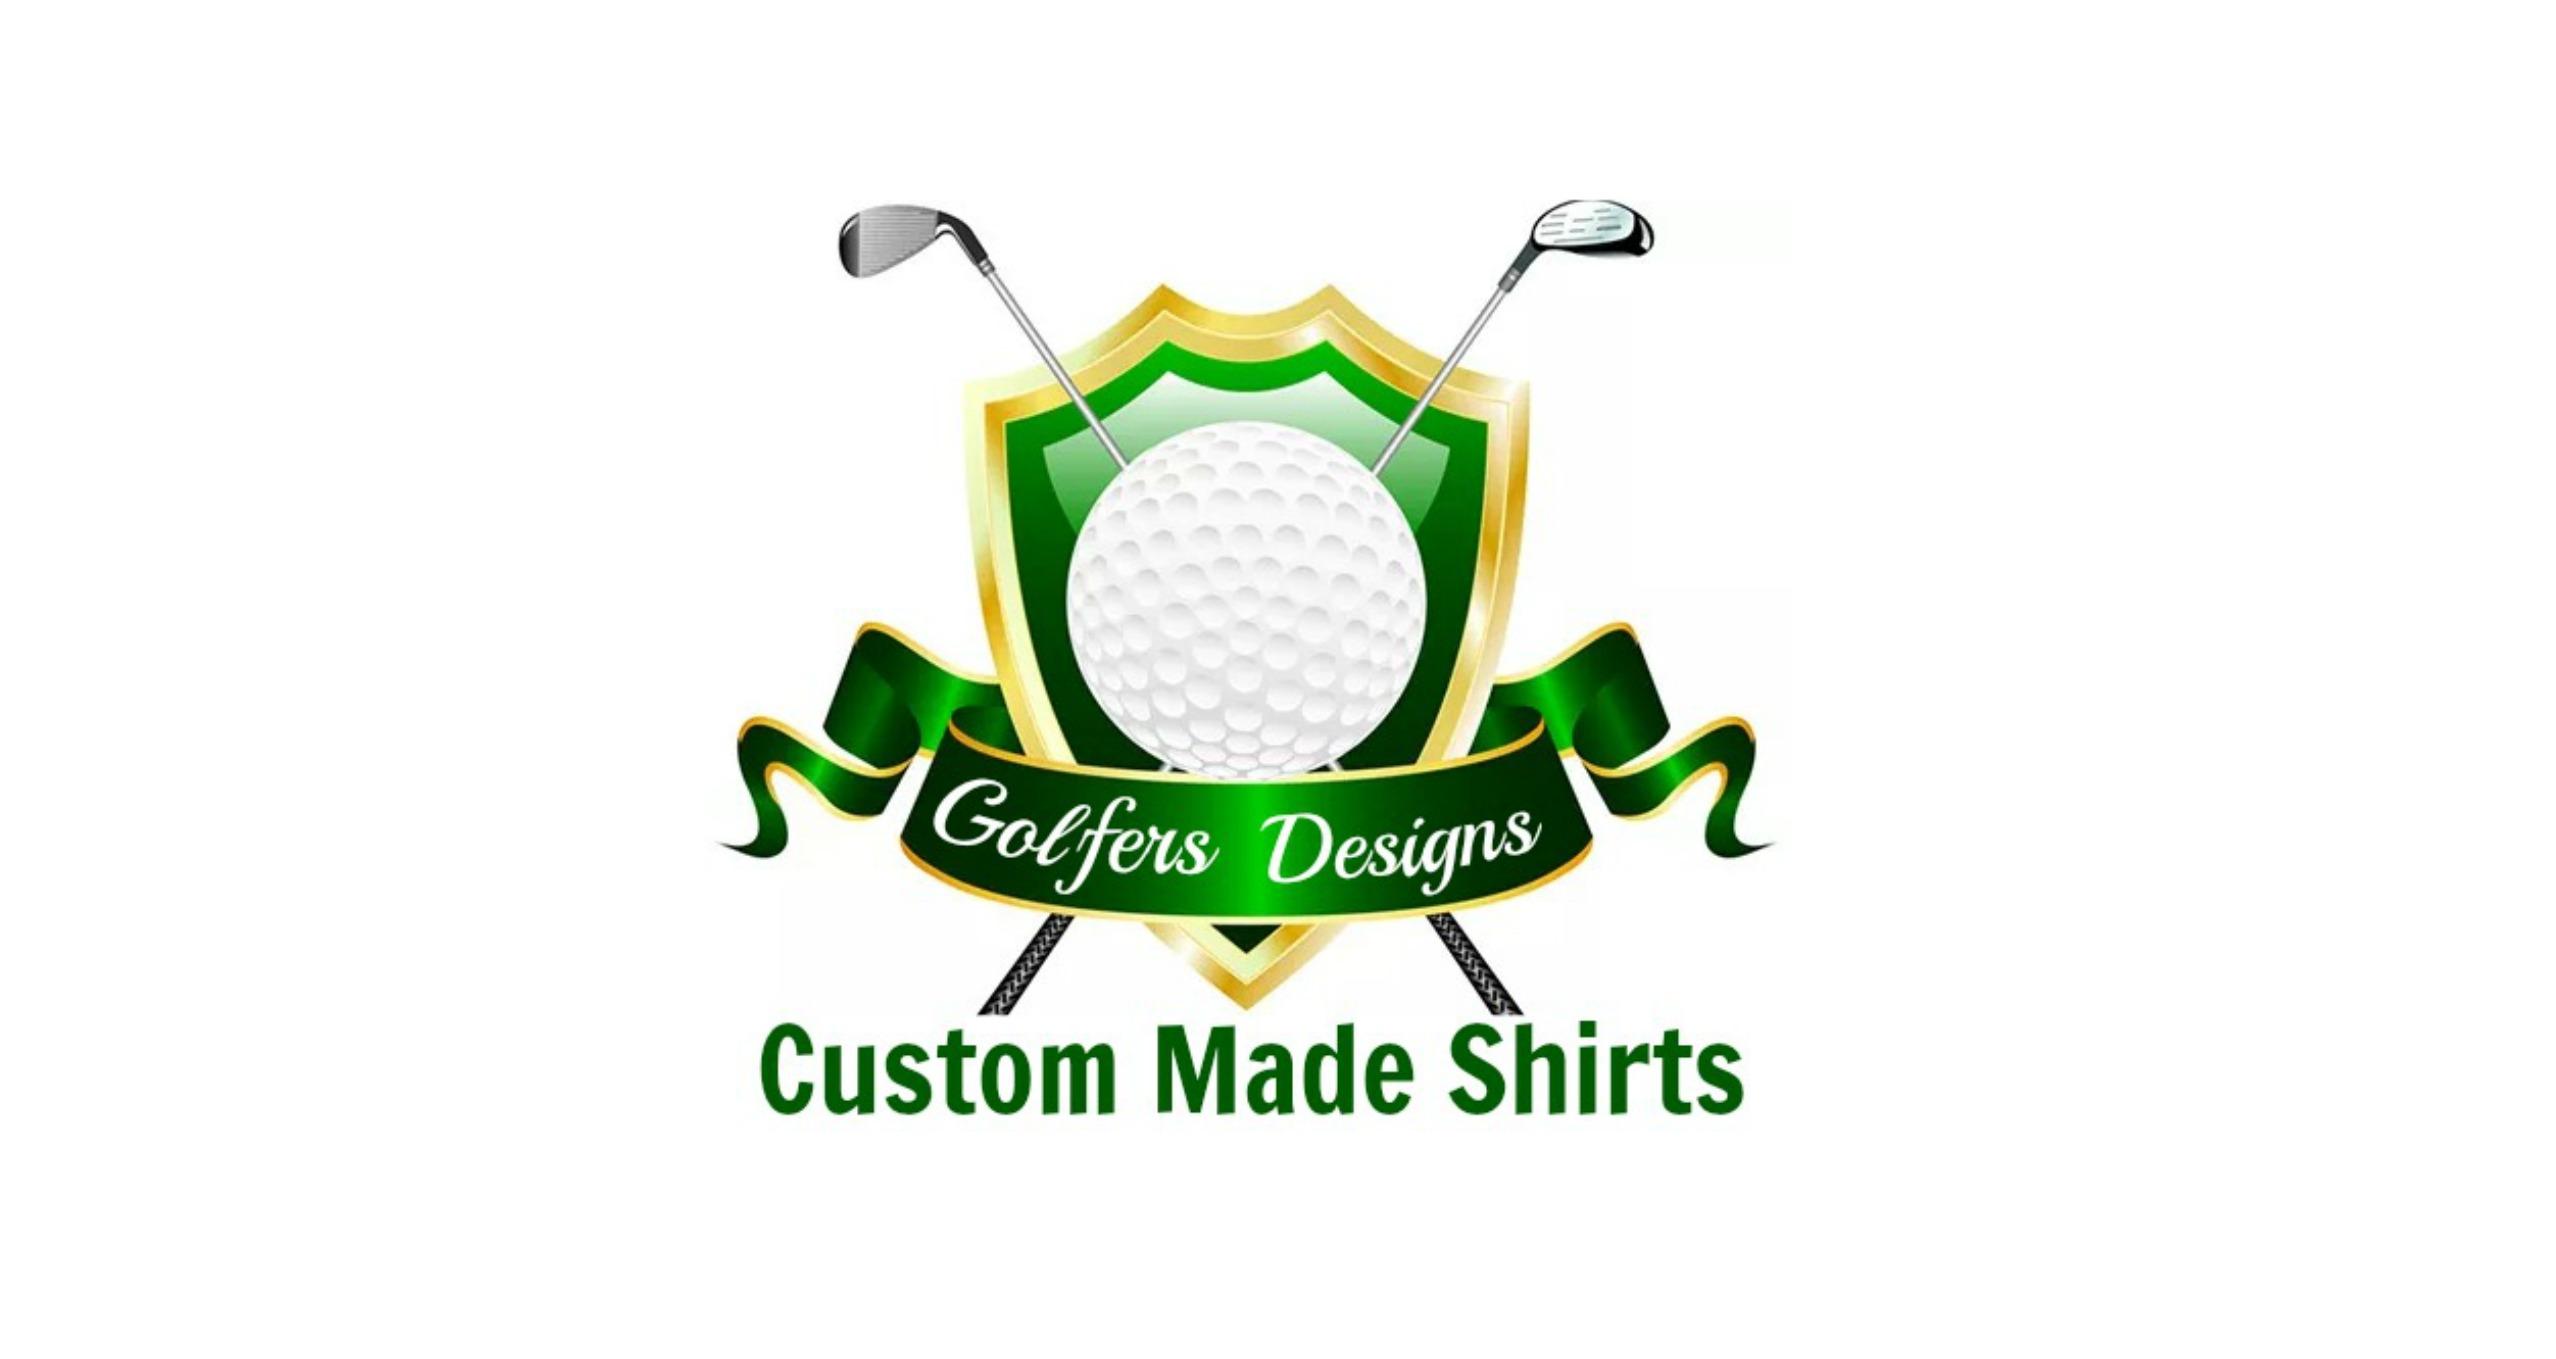 Golfers Designs